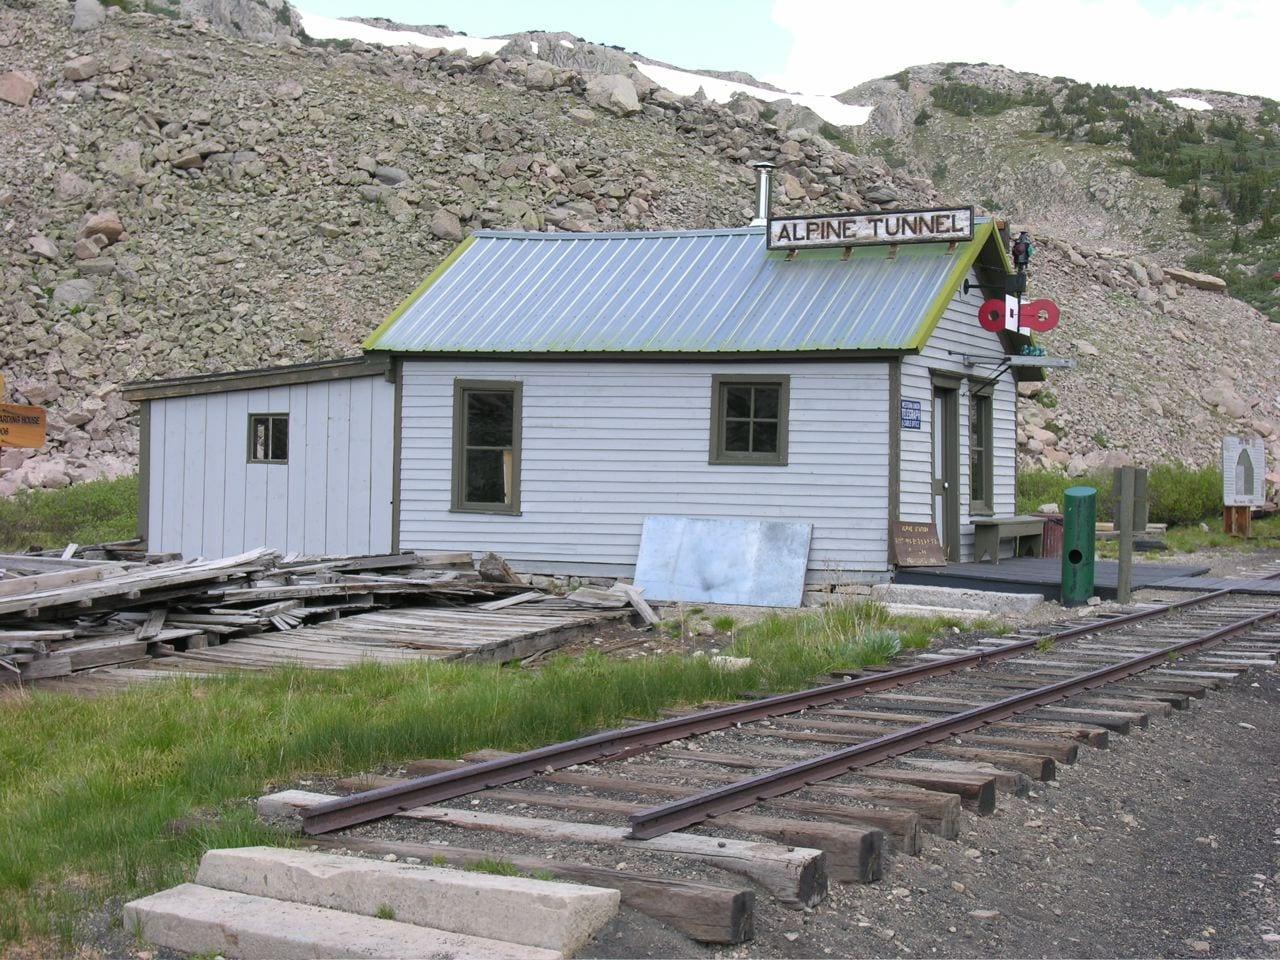 Alpine Tunnel telegraph station, CO